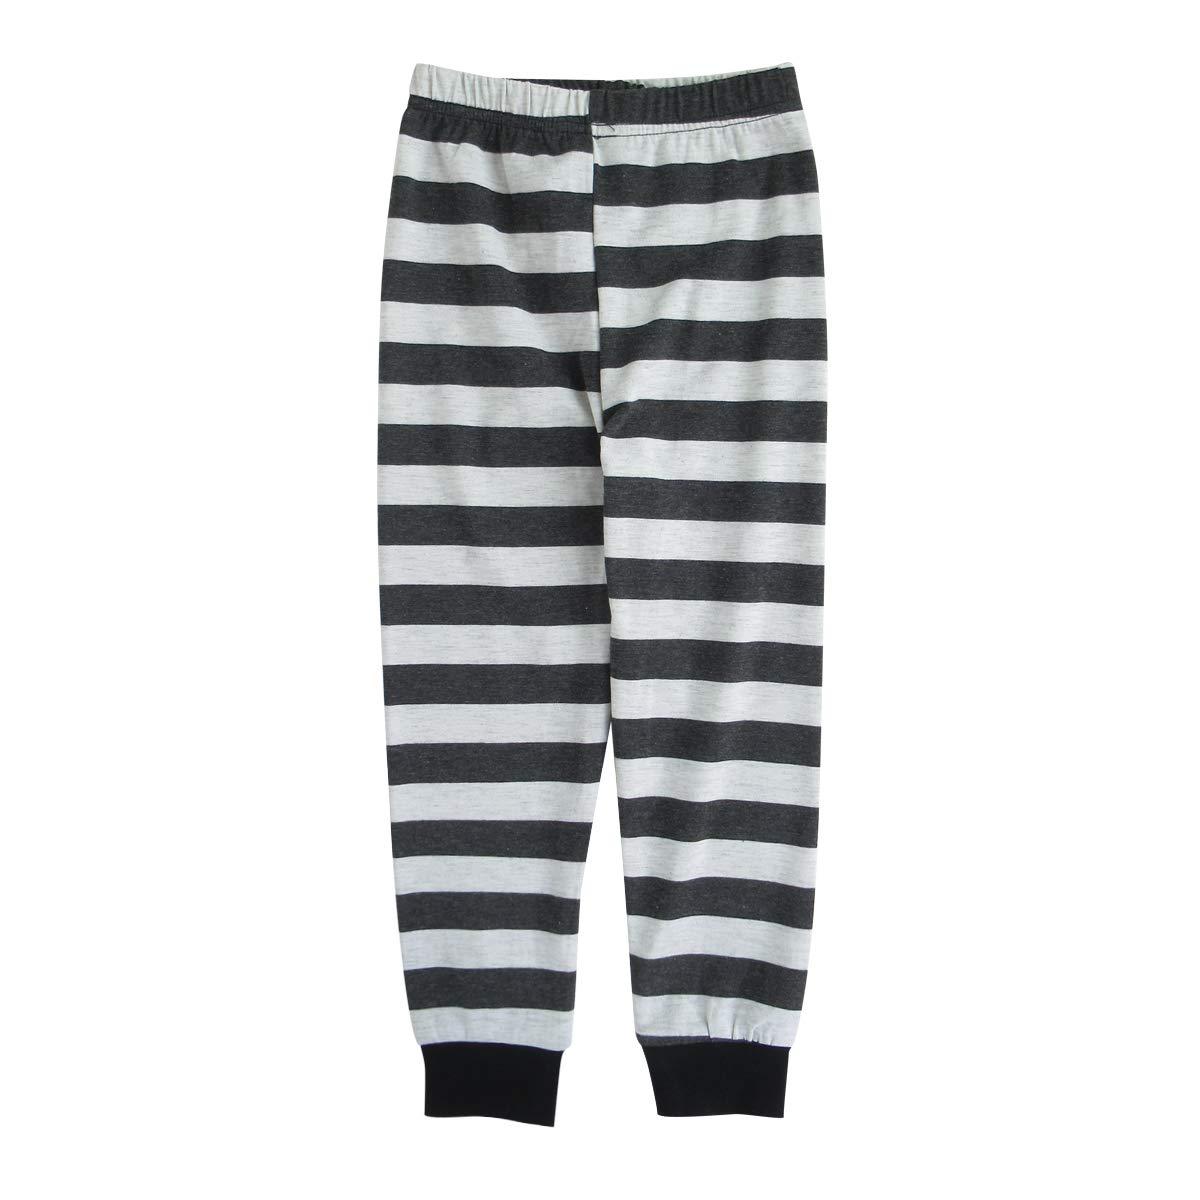 MOMBEBE COSLAND Kids Cotton Pajamas Set Kids Sleepwear